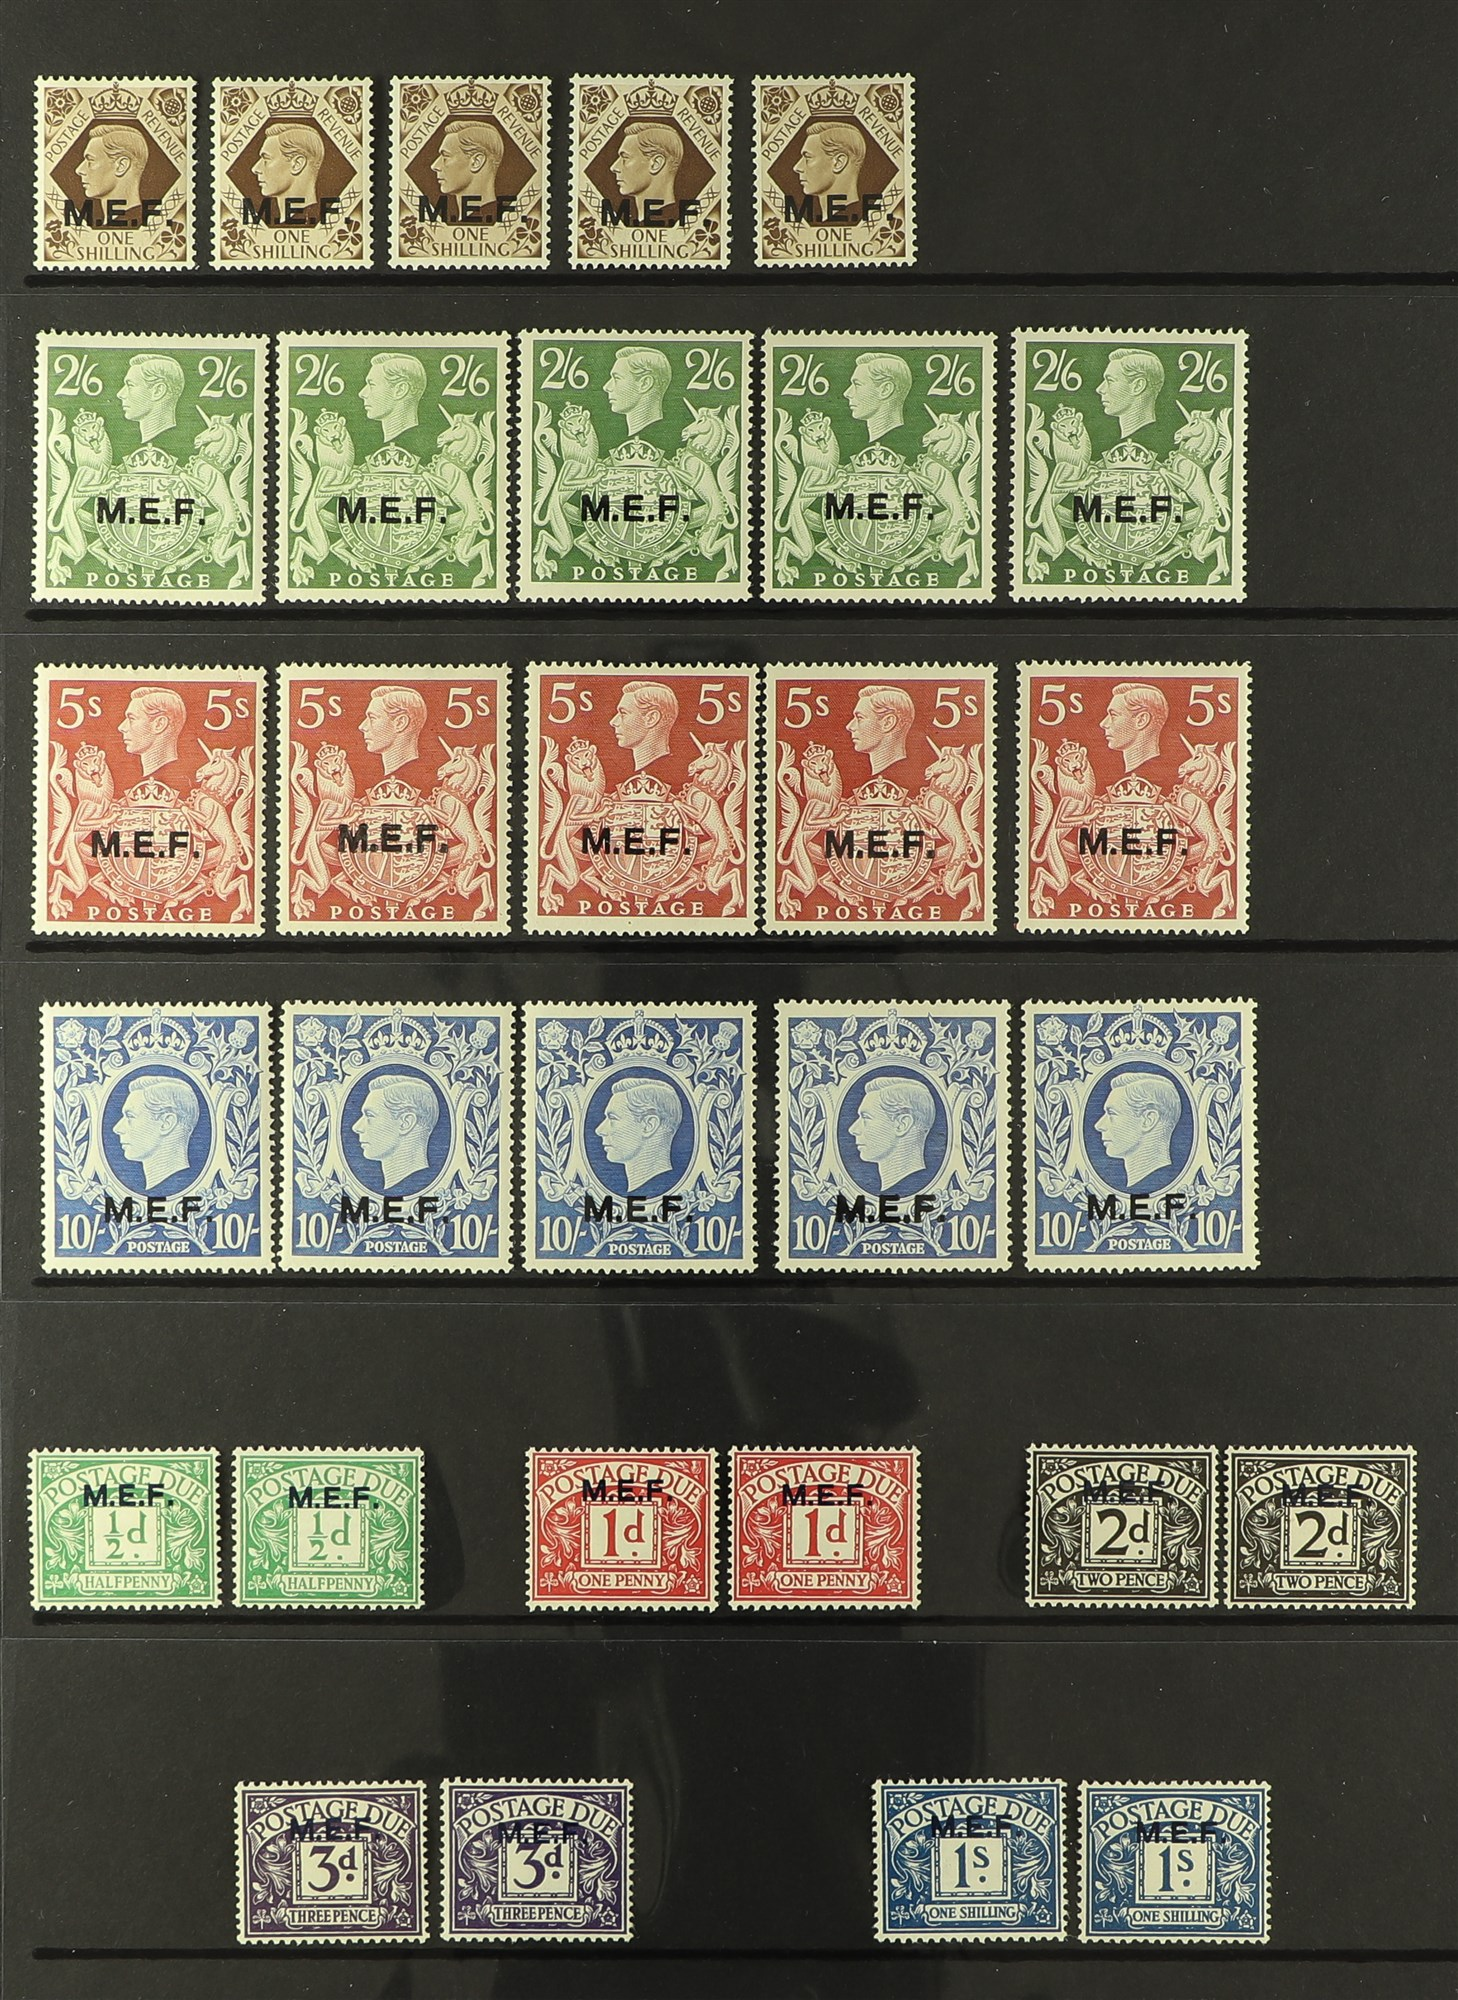 BR. OCC. ITAL. COL. M.E.F. 1942-47 mint range incl. 1942 sets x2, 1943-47 sets x5 & 1942 Postage due